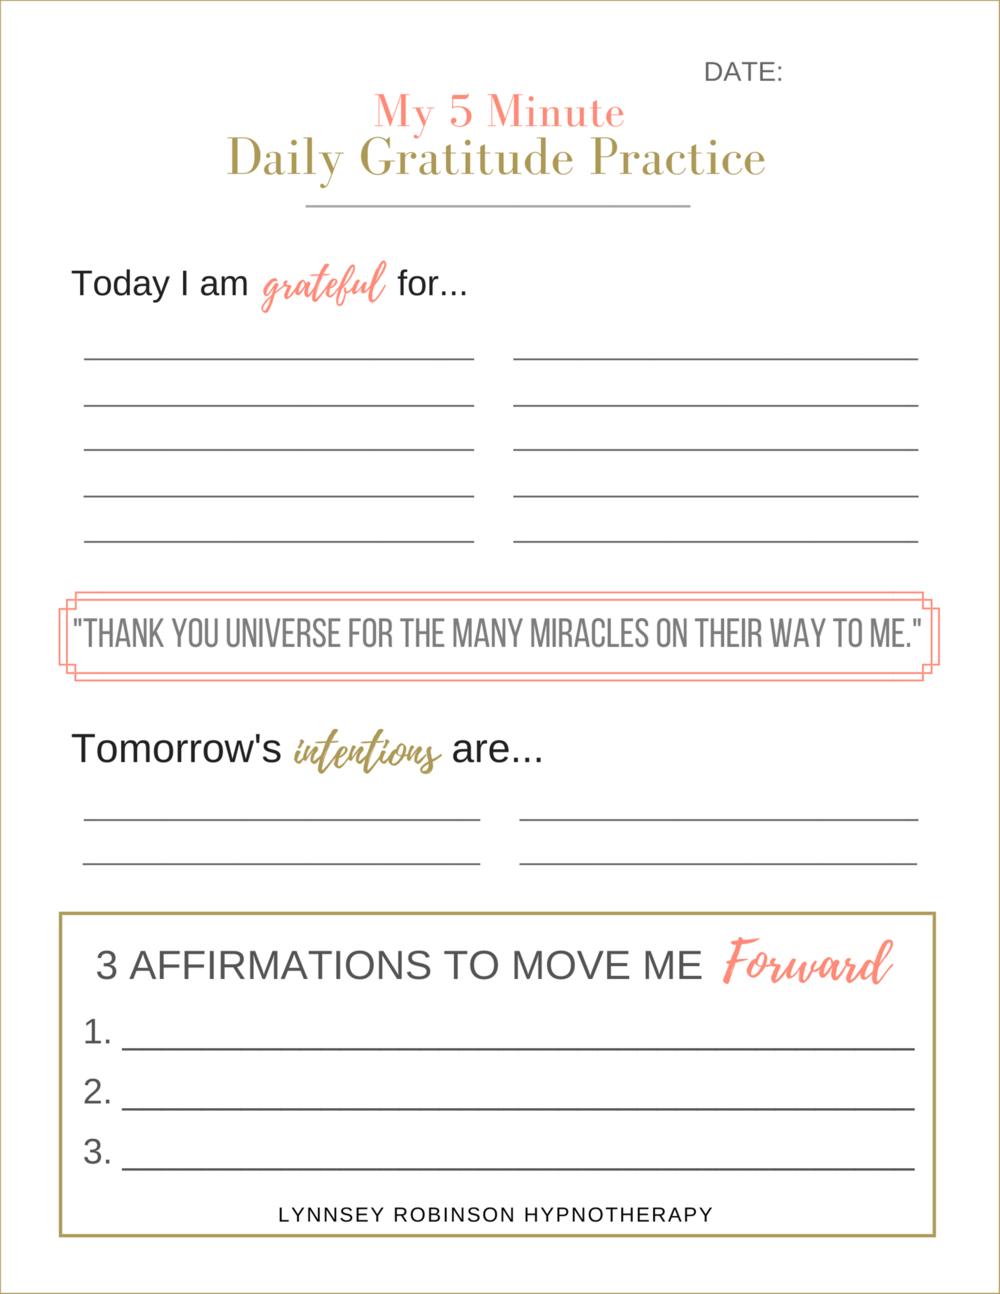 Copy of 5 MINUTE DAILY GRATITUDE PRACTICE